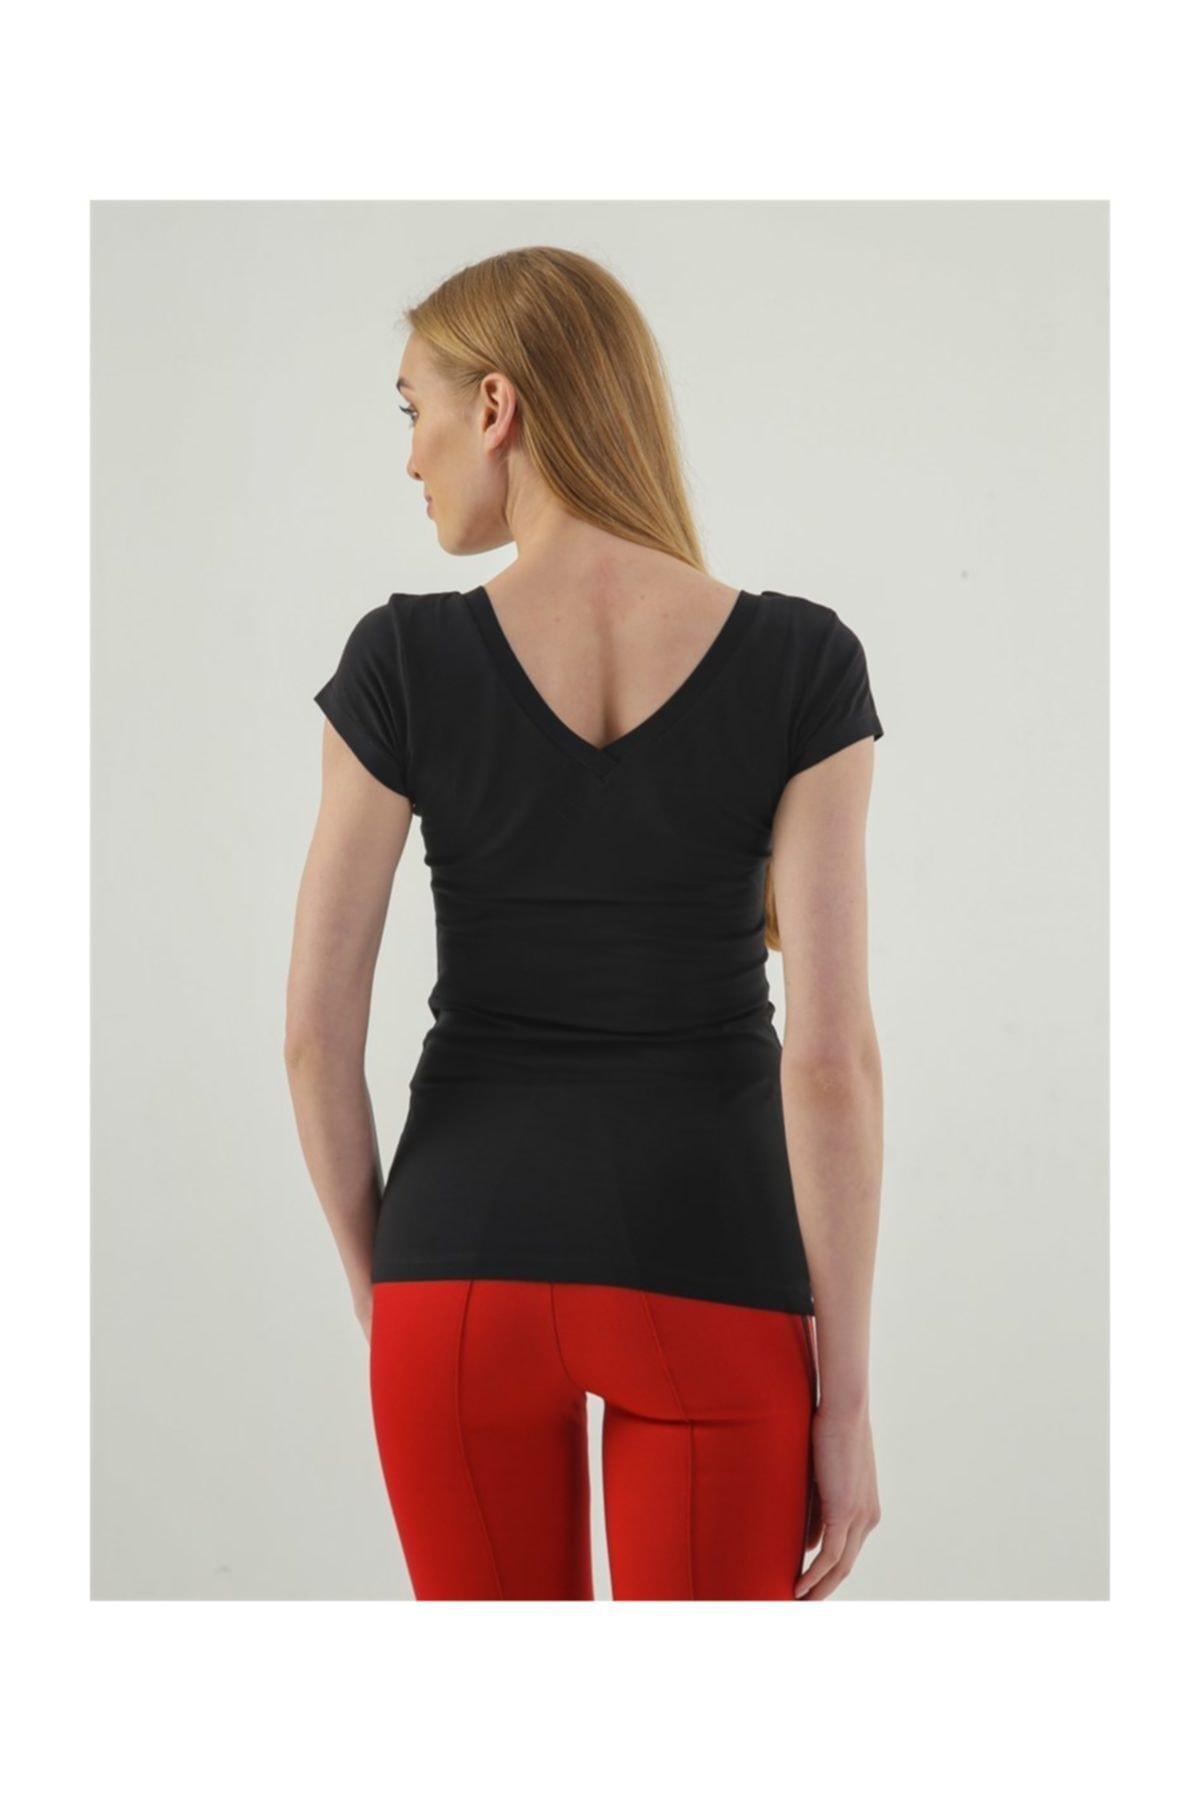 Jument Kadın Siyah Monalisa Ön Arka V Yaka Kısa Kol T-Shirt 5612 2